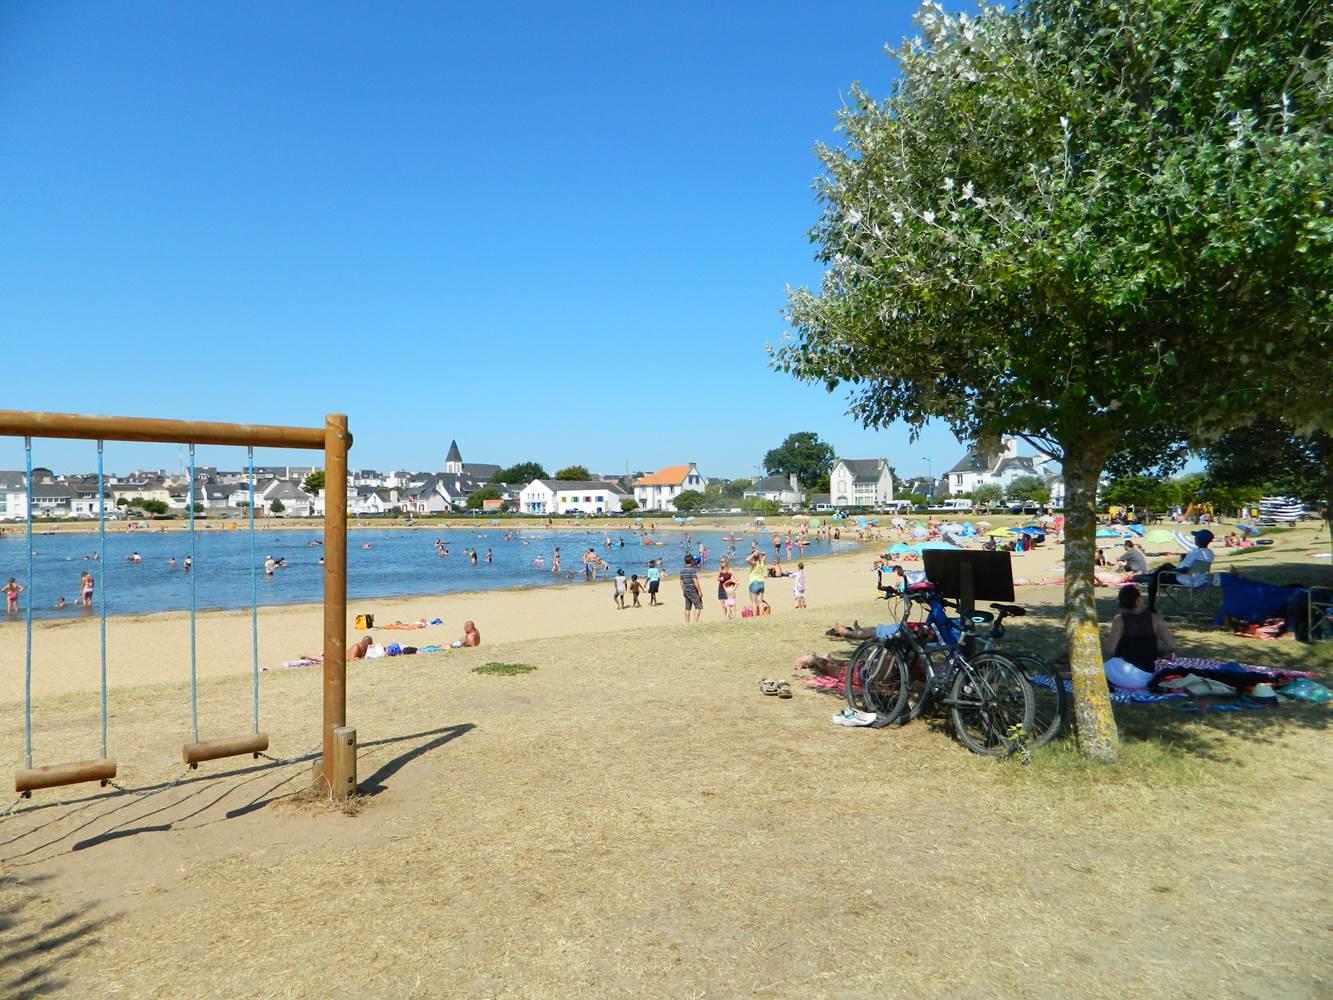 Plage des enfants - 2 - Etel - Morbihan Bretagne Sud © OTSI Baie de Quiberon